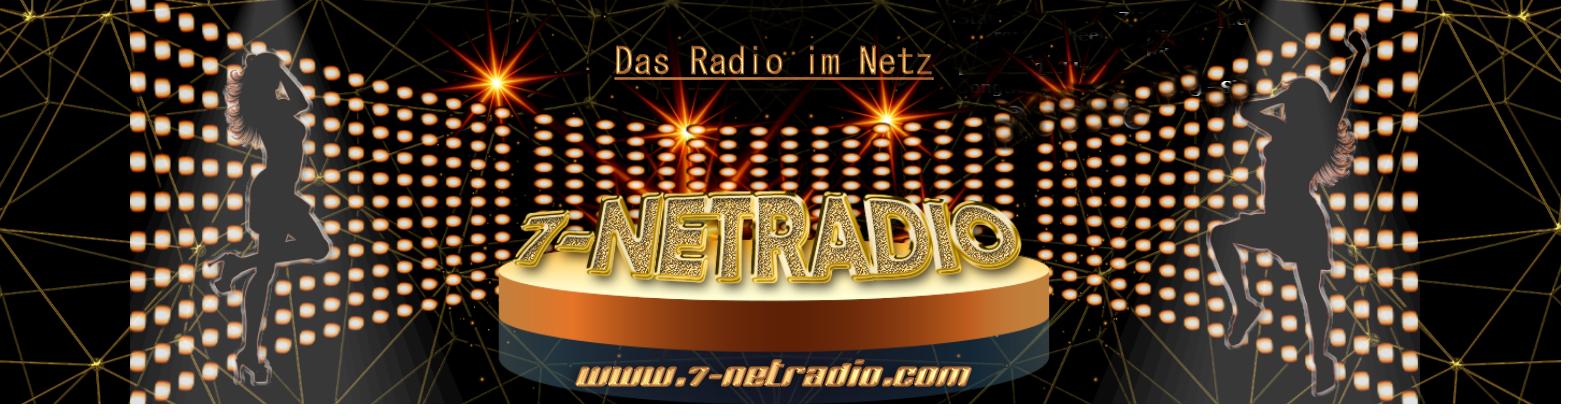 7-netradio